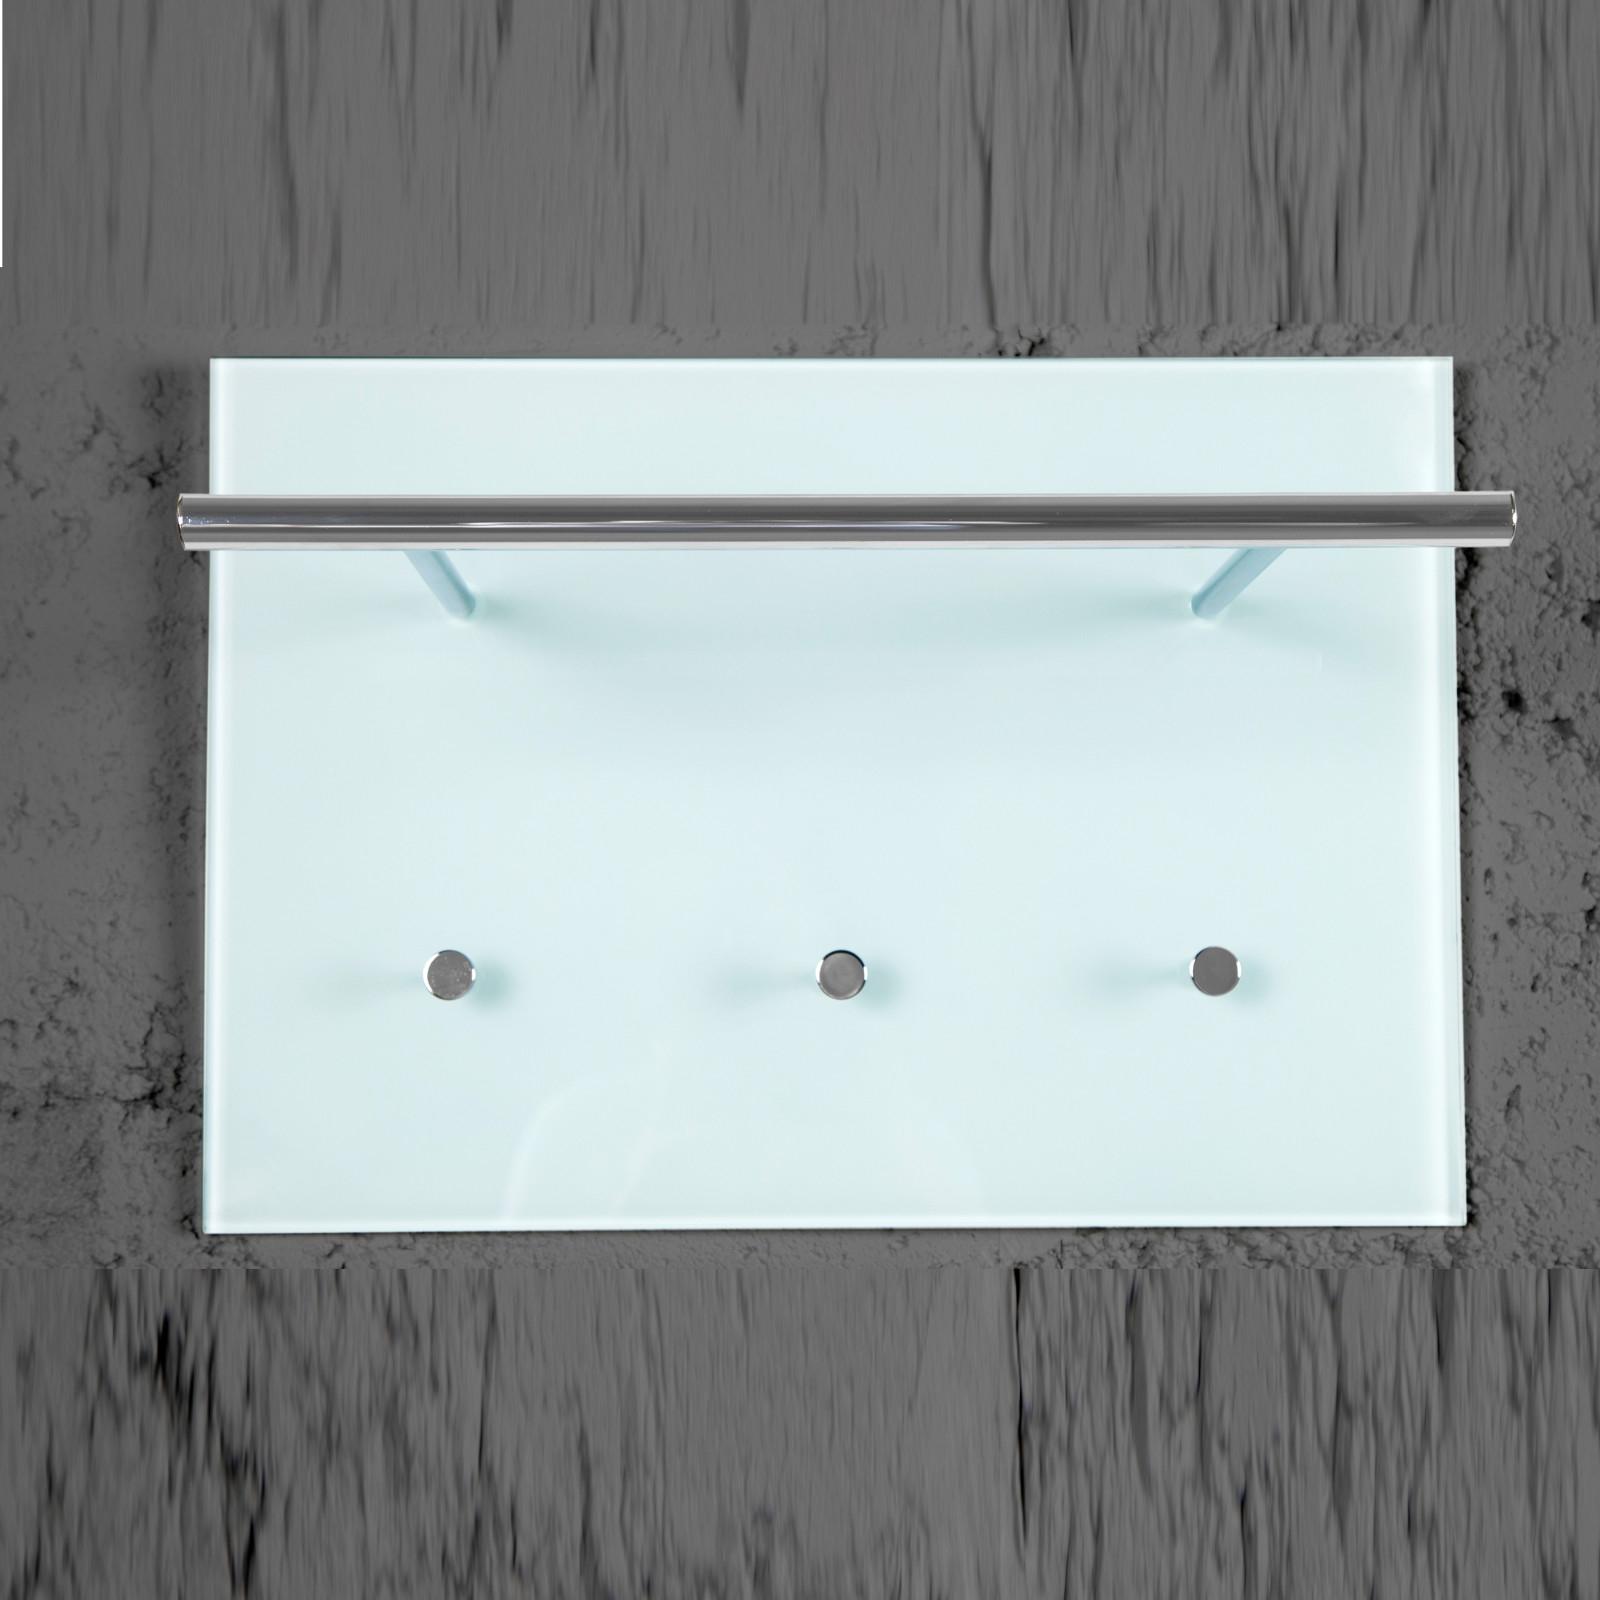 edle design wandgardeobe azzaretti glas chrom wandhaken garderobe modern. Black Bedroom Furniture Sets. Home Design Ideas